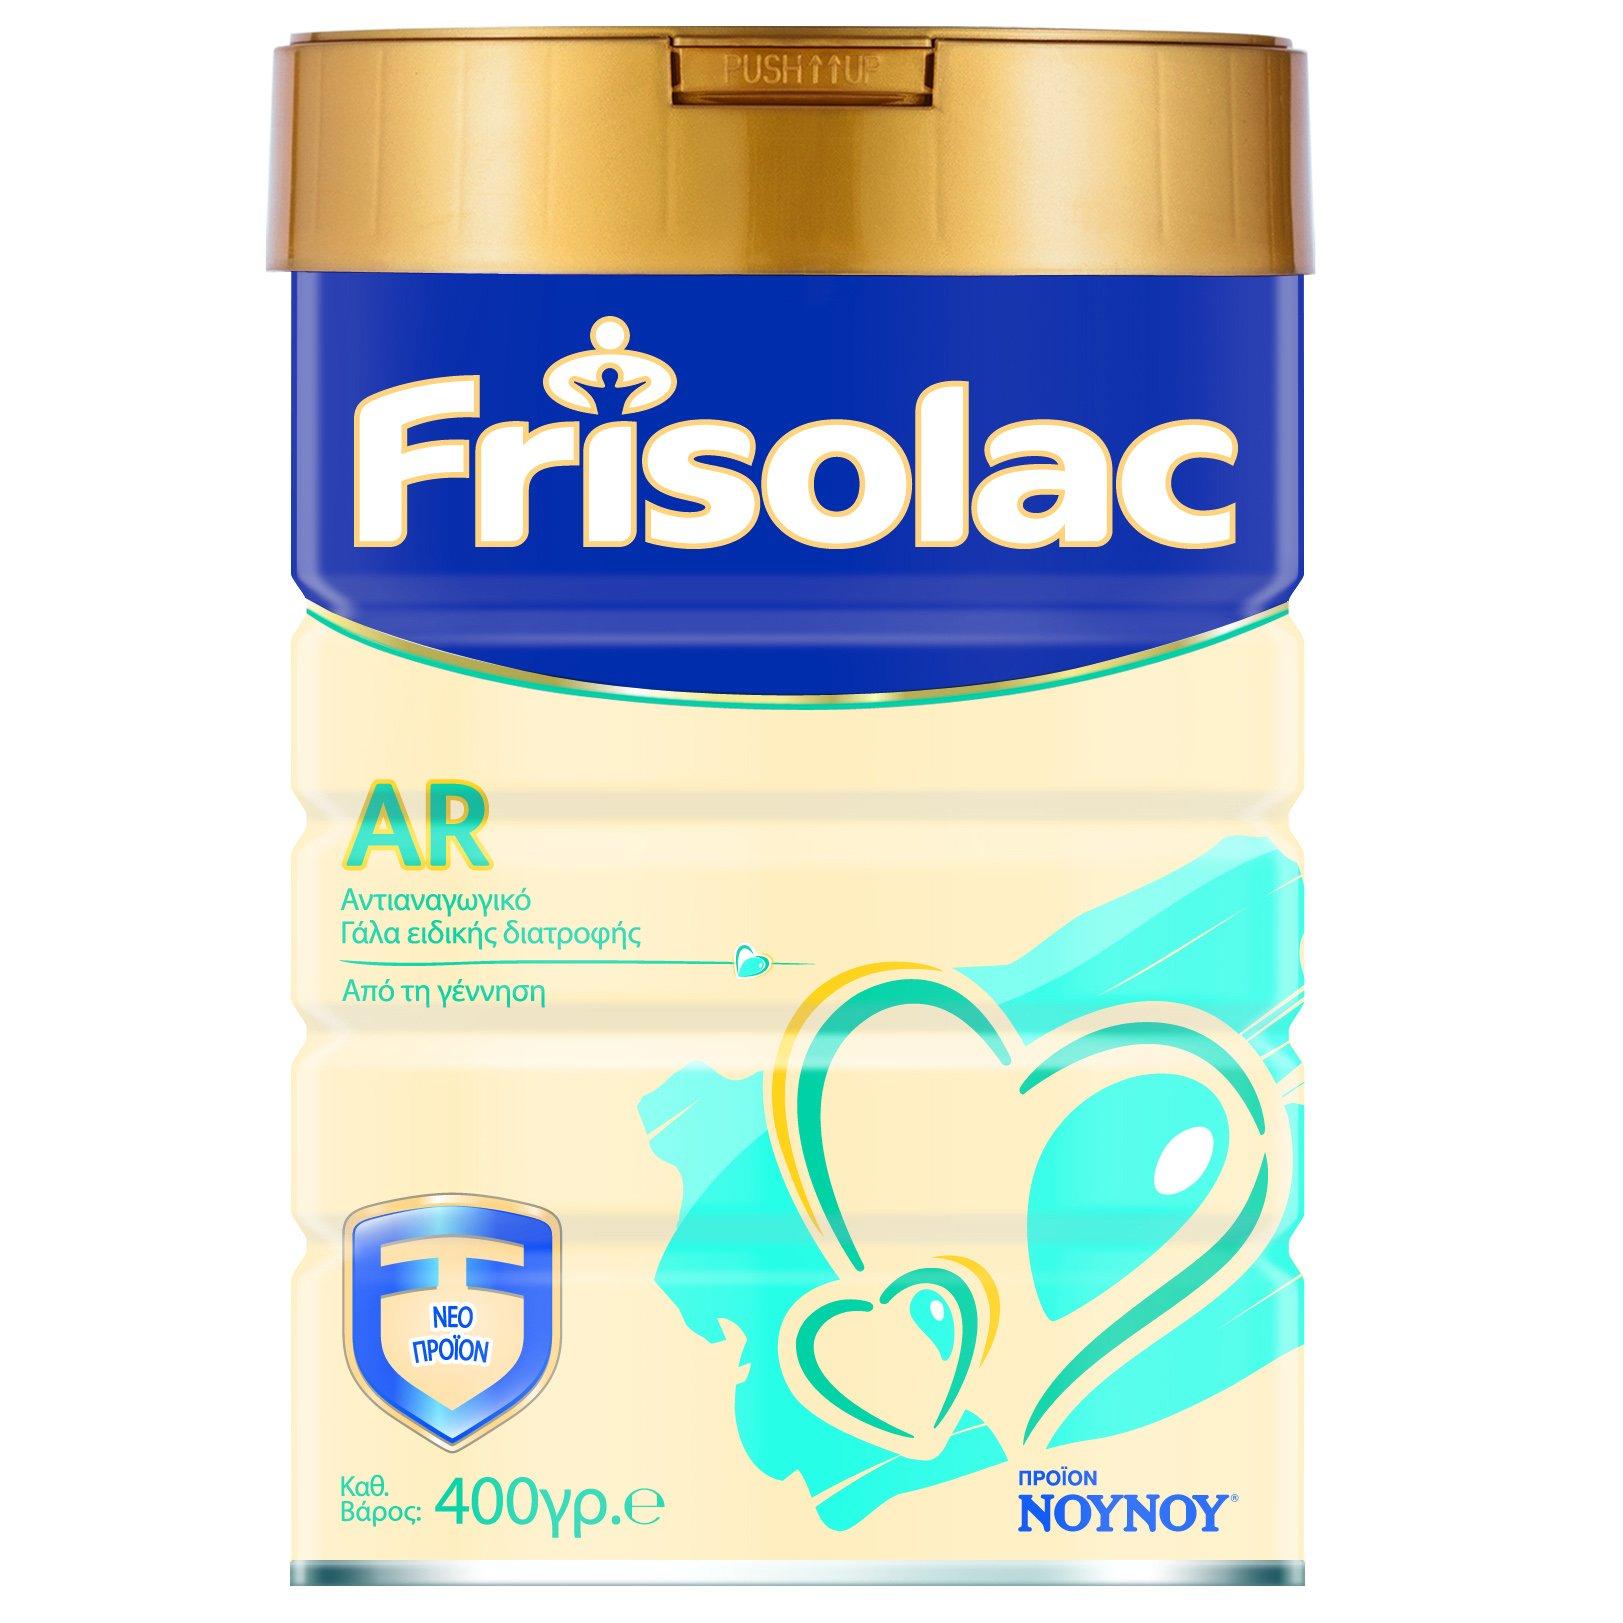 Frisolac AR Αντιαναγωγικό Γάλα Ειδικής Διατροφής Κατάλληλο από την Γέννηση 400gr